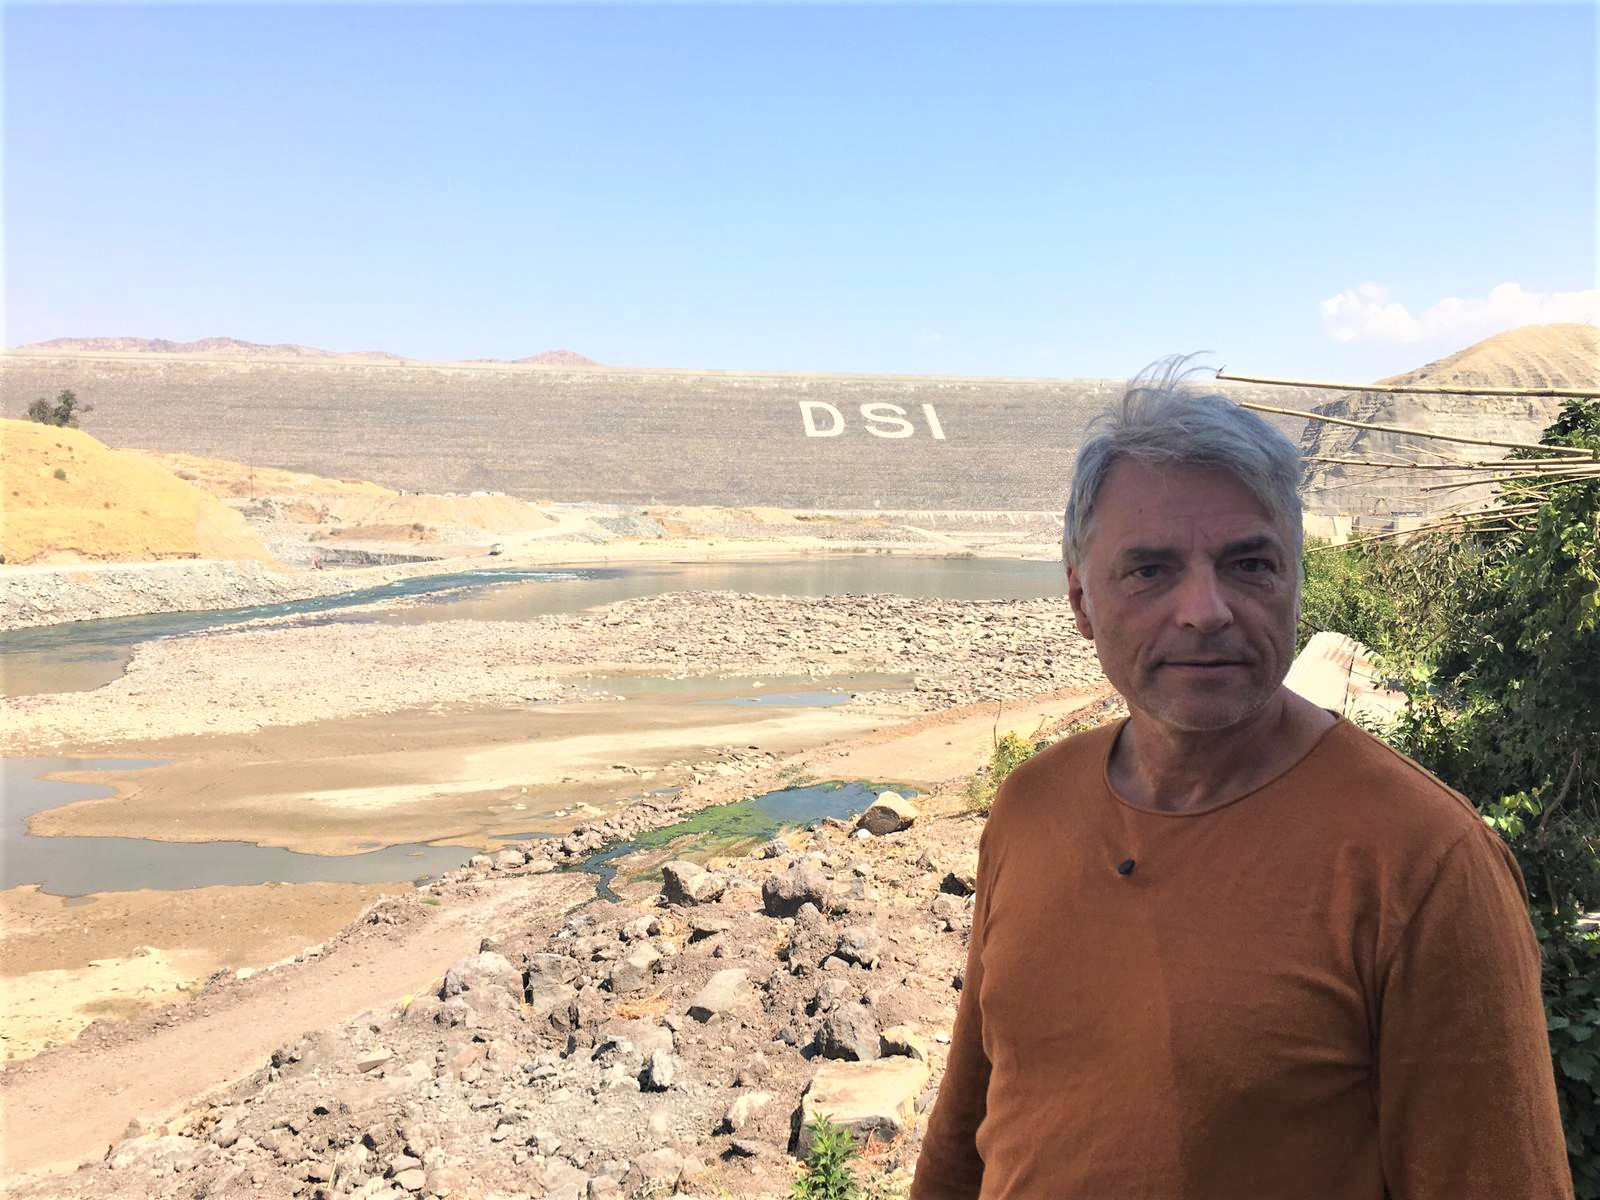 Ulrich Eichelmann says farewell to Hasankeyf, the drowning World Heritage Site. © Riverwatch